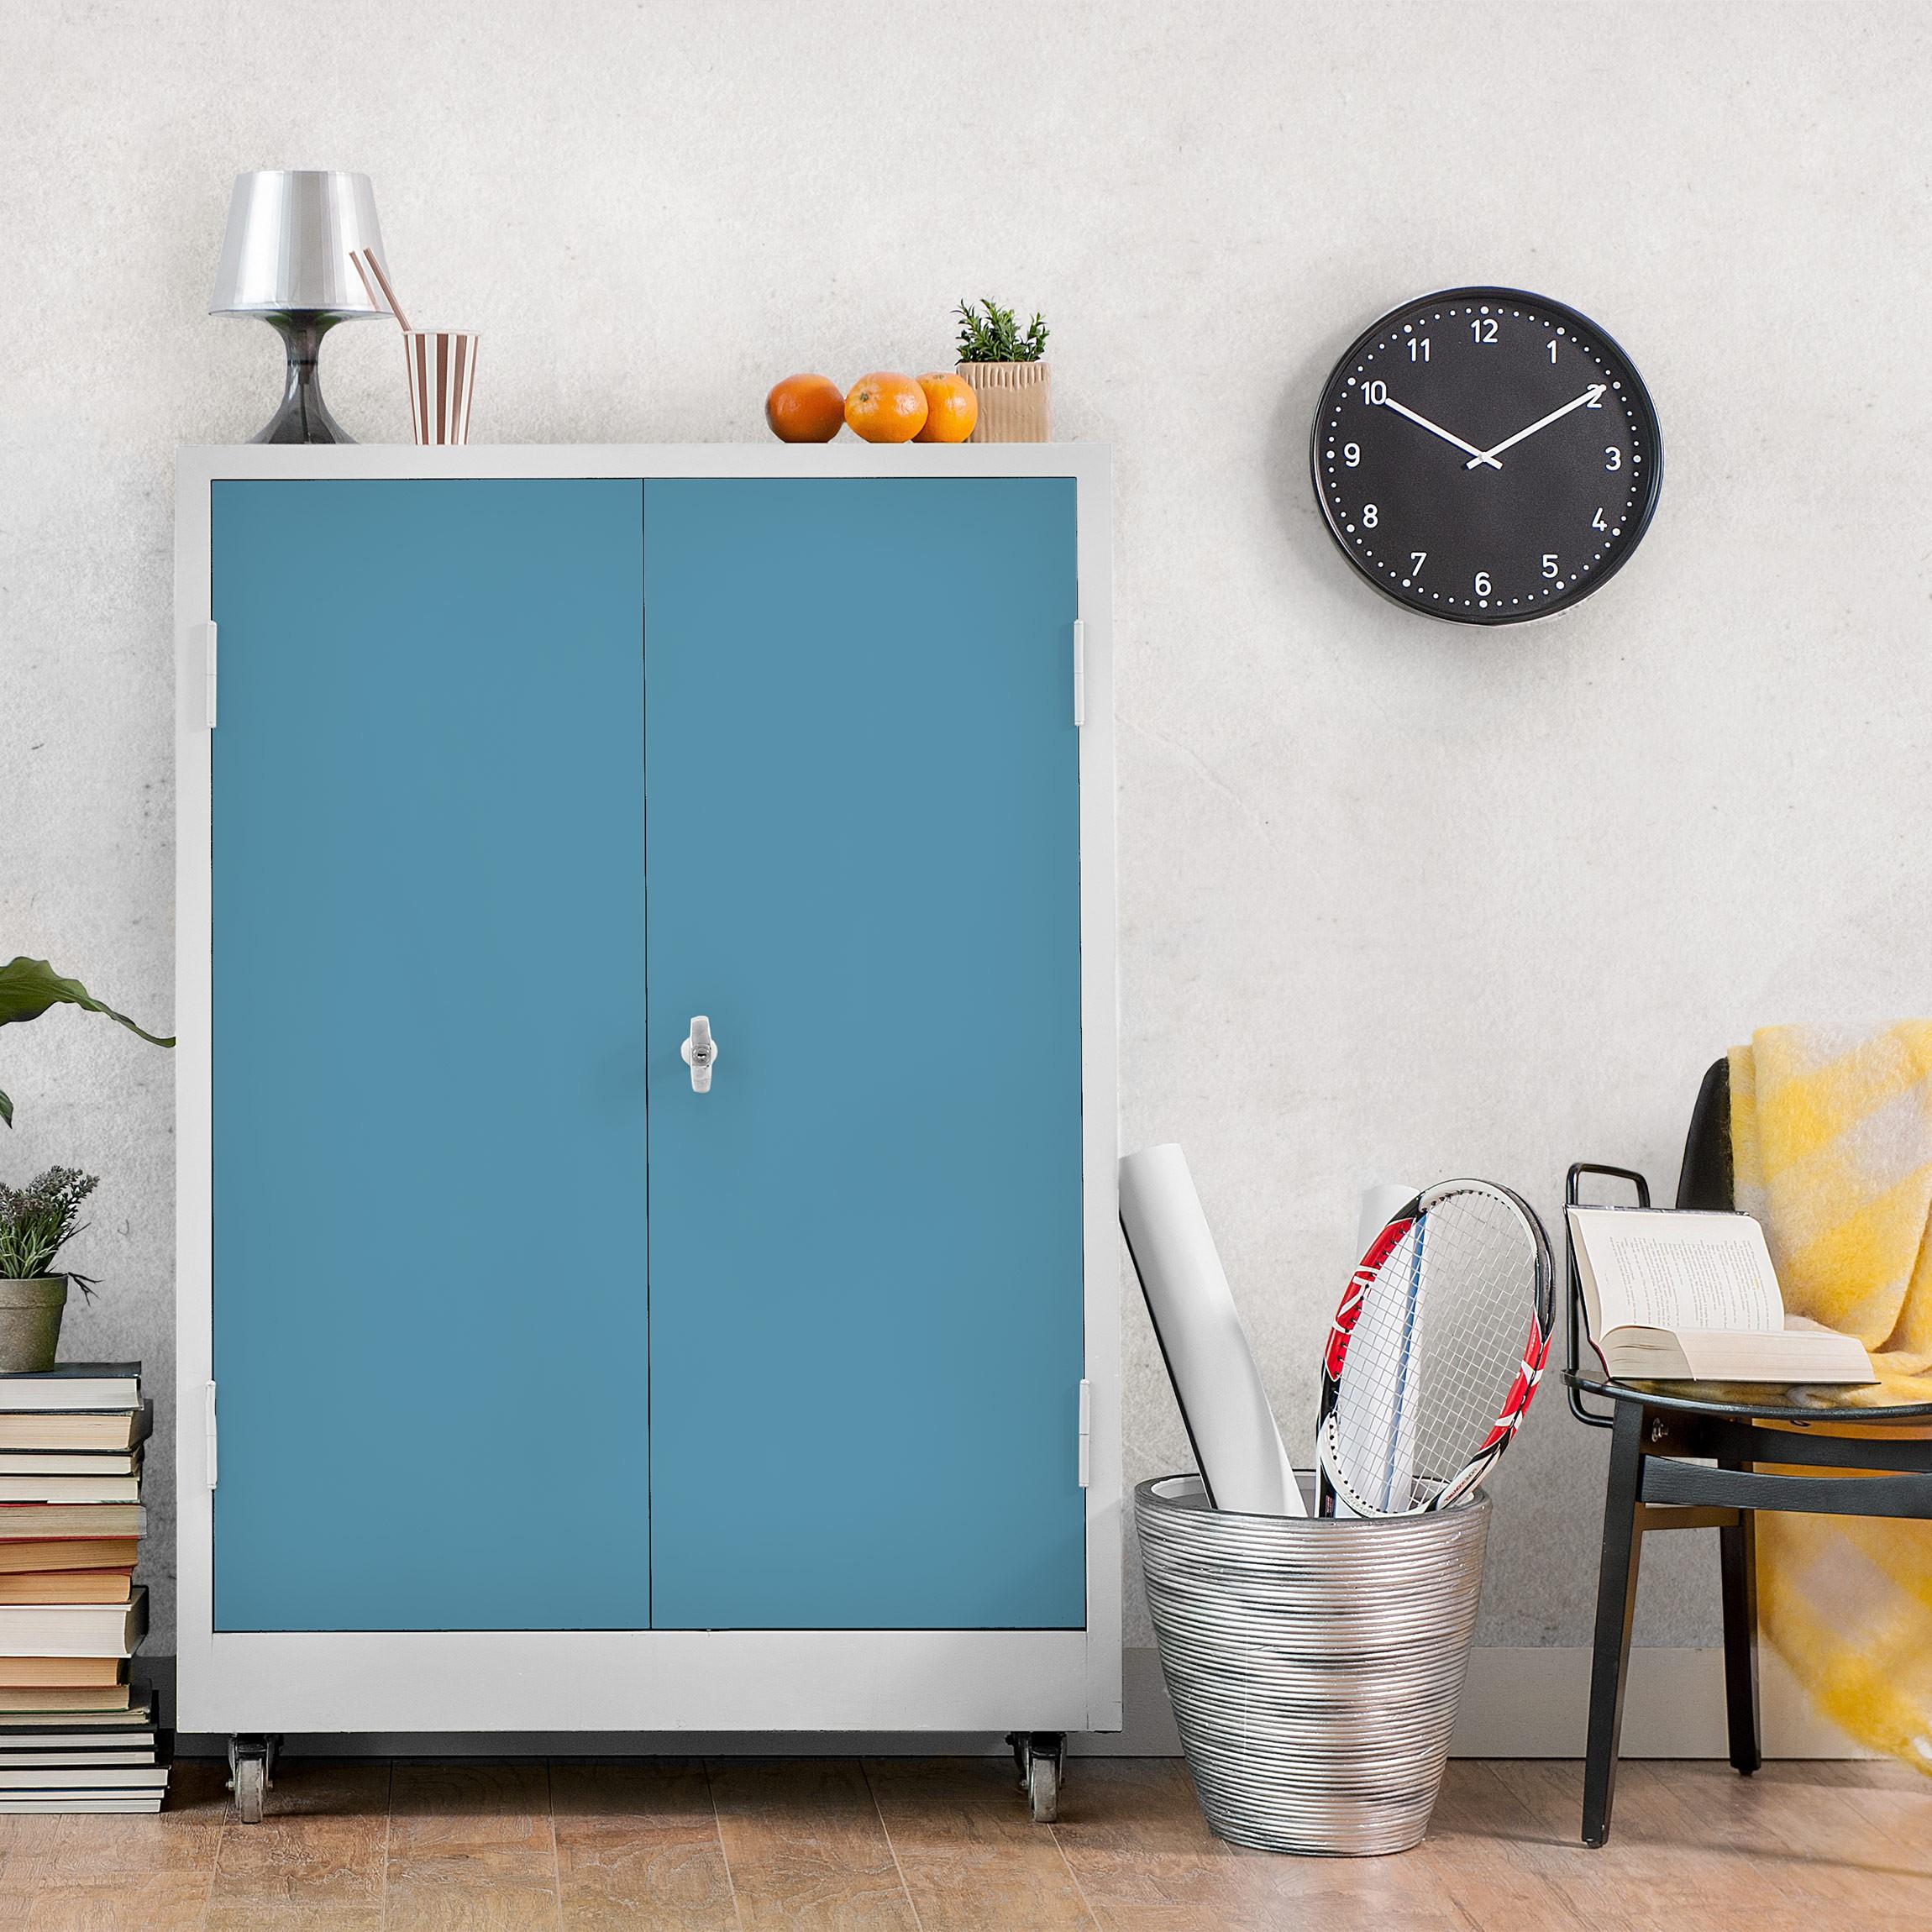 m belfolie blau grau einfarbig meerblau klebefolie f r. Black Bedroom Furniture Sets. Home Design Ideas